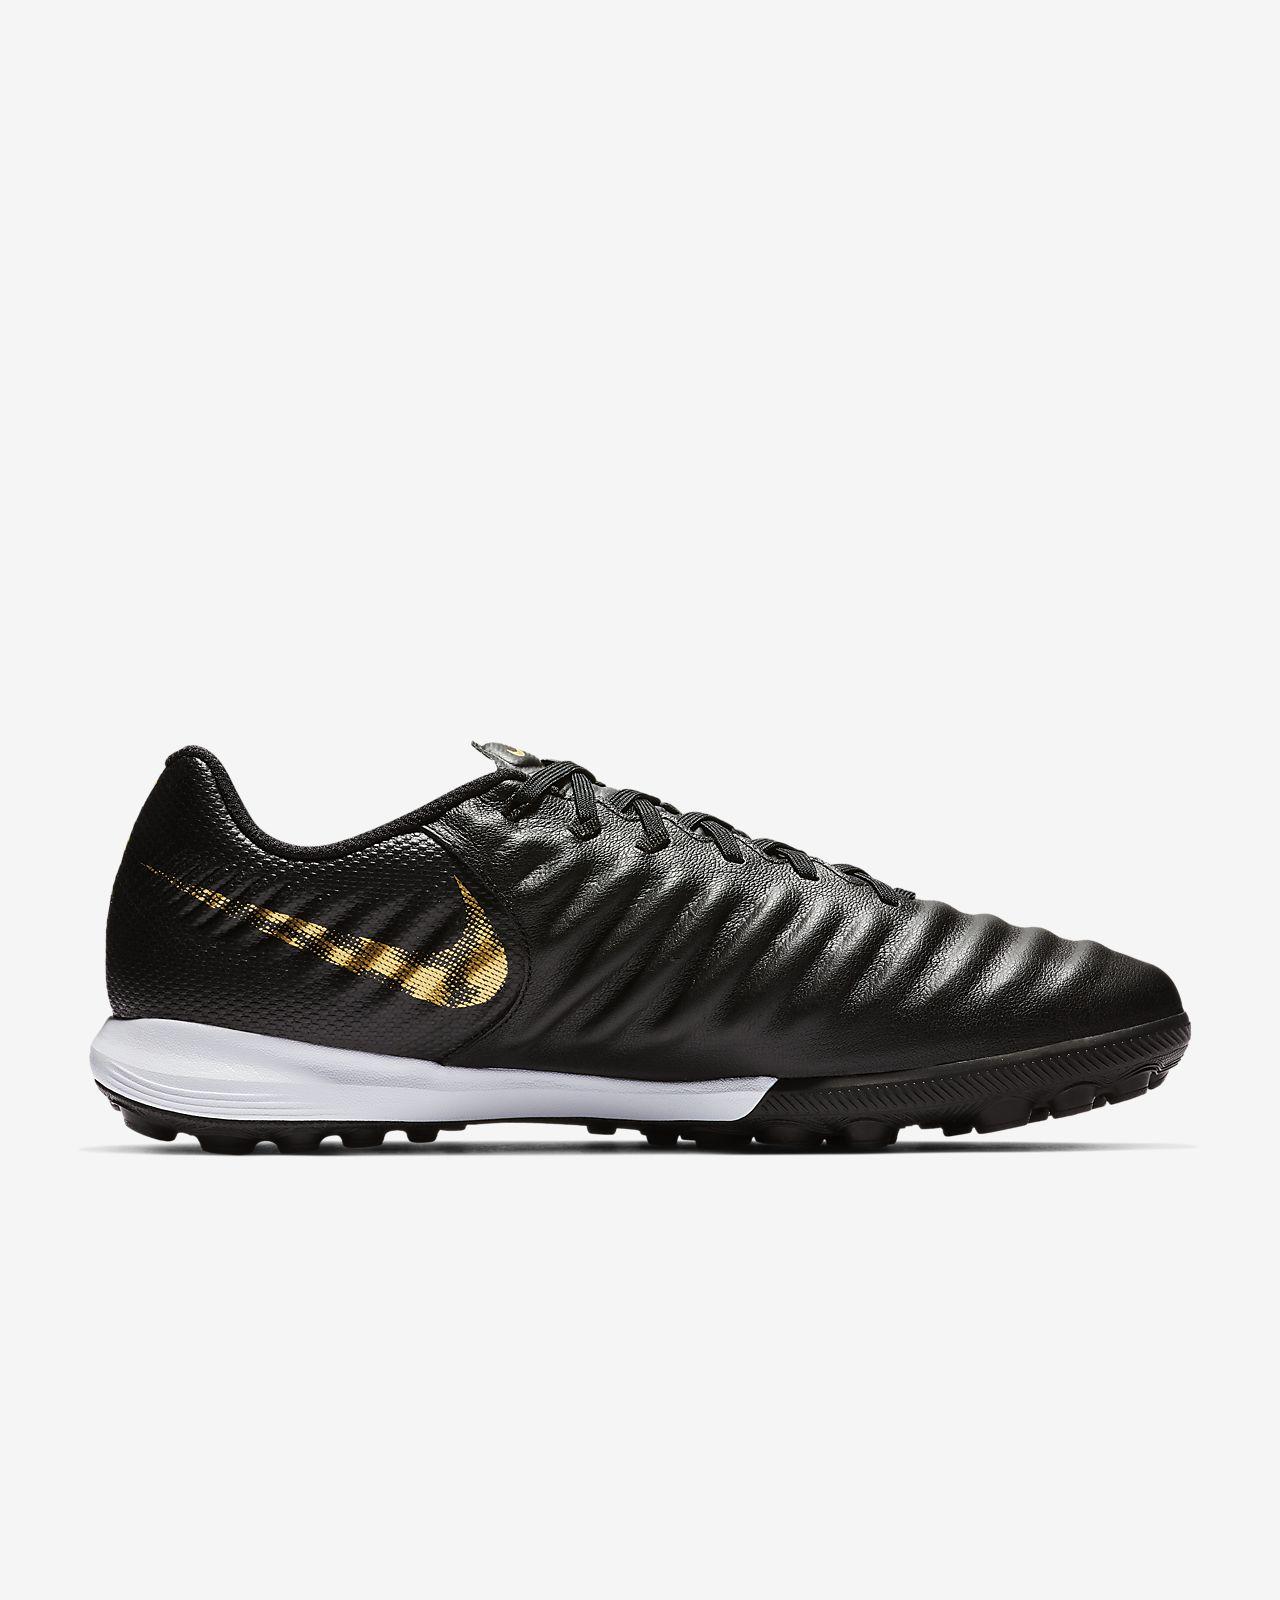 Terrain Synthétique Crampons De Nike Chaussure À Pour Football wNn0vm8